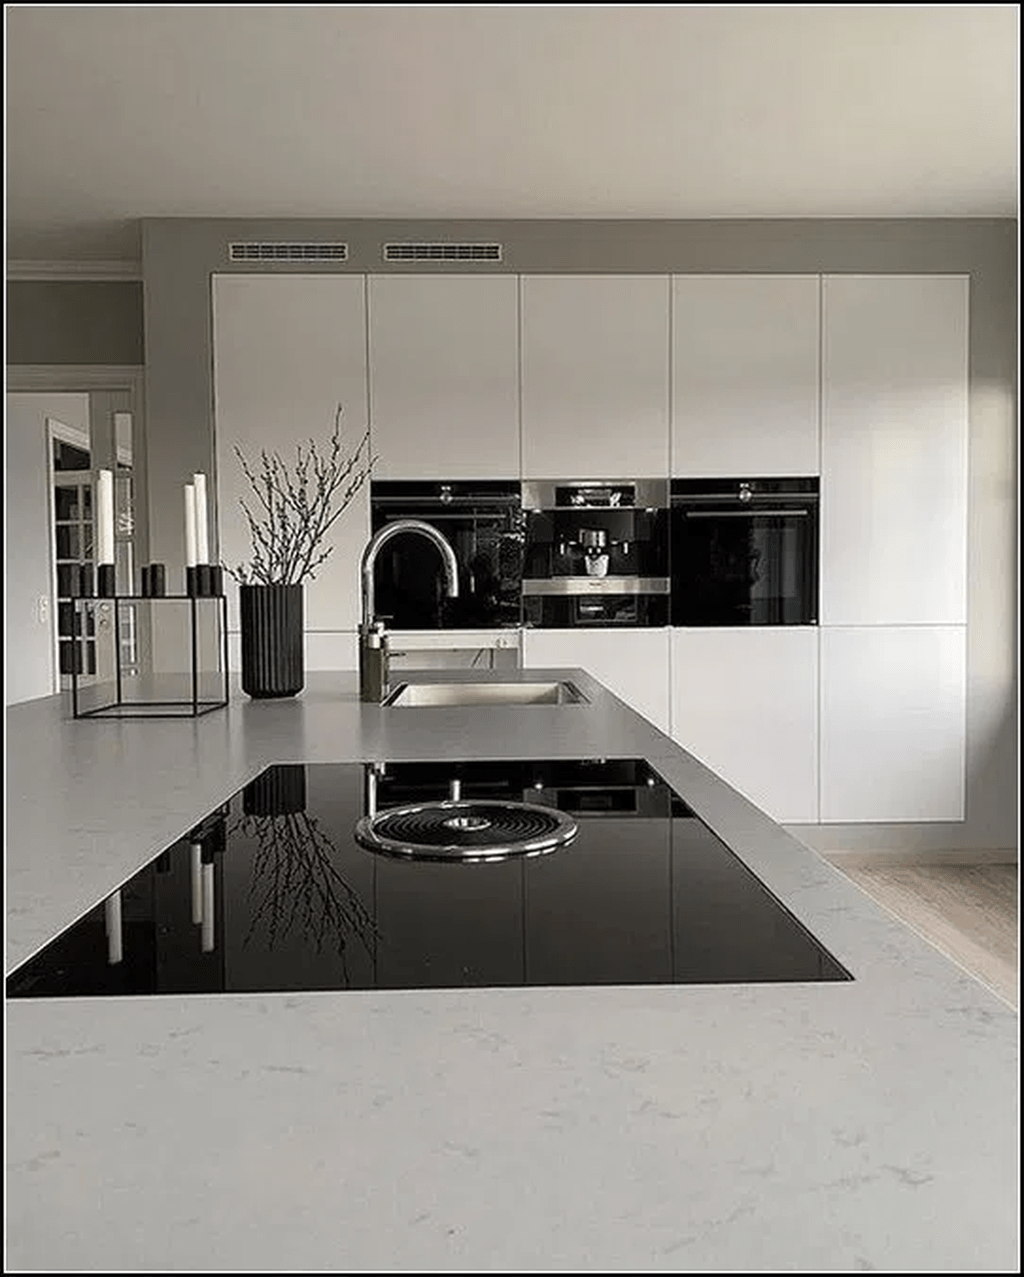 39 Amazing Luxury Kitchens Design Ideas With Modern Style Interiordesignbedroom Interiordesig Kitchen Room Design Modern Kitchen Design Dream Kitchens Design